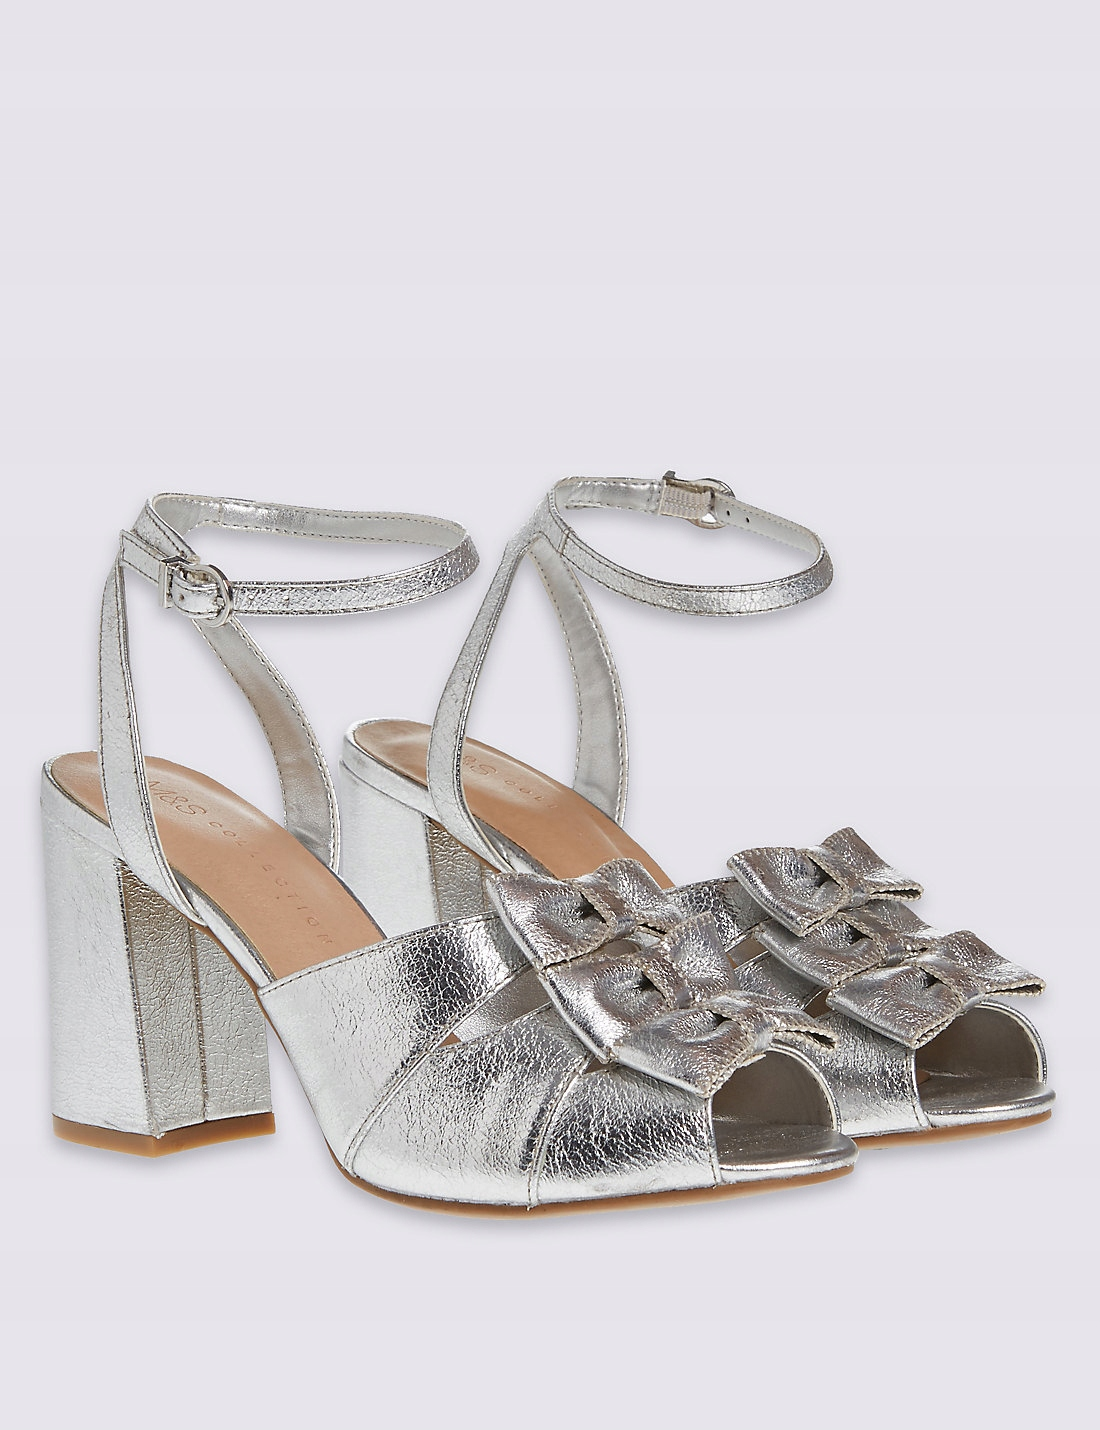 sandały srebrne kokardki słupek M&S Insolia 39 7439590723